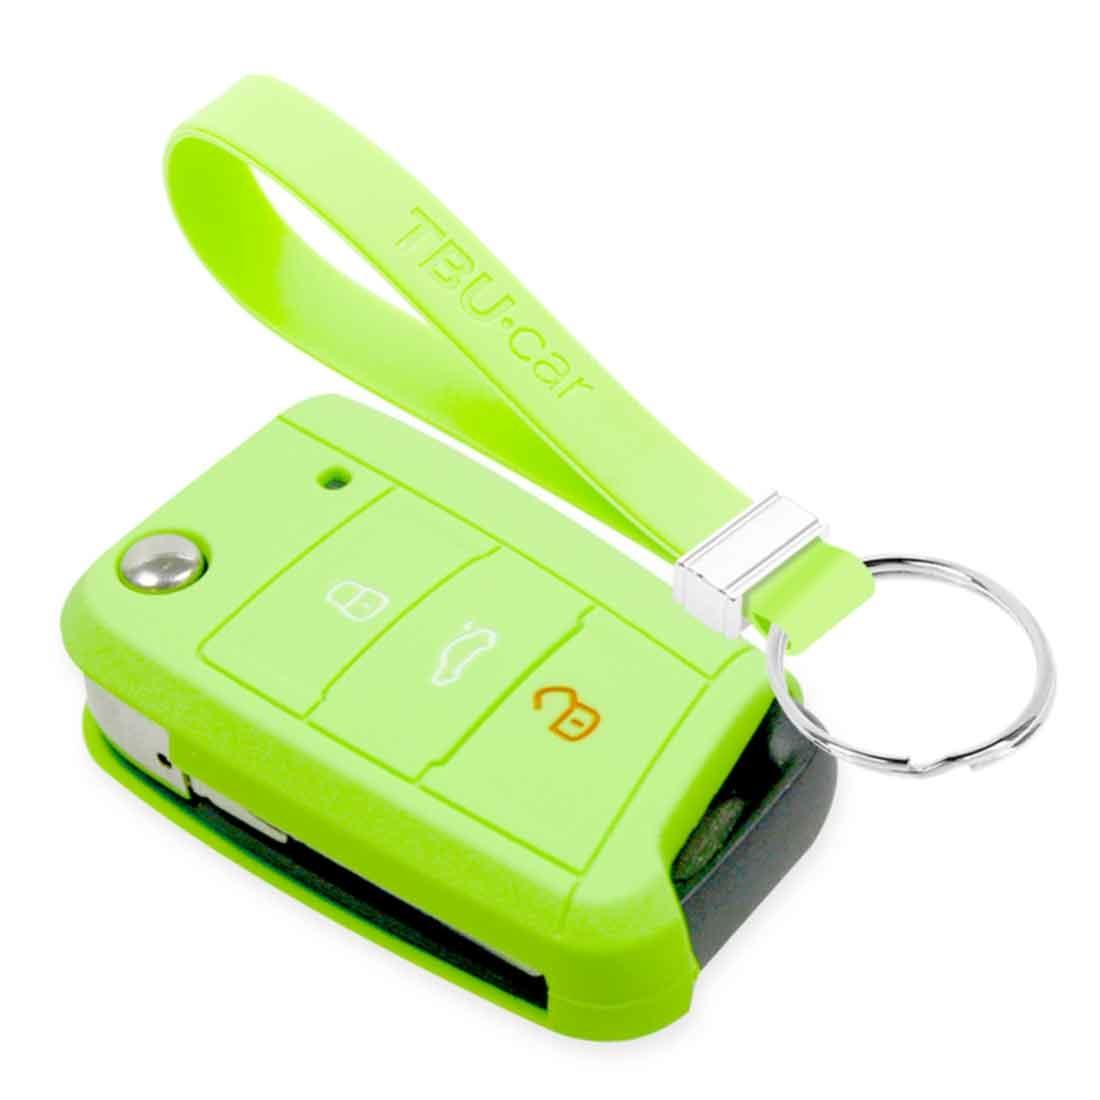 TBU car TBU car Funda Carcasa llave compatible con Audi - Funda de Silicona - Cover de Llave Coche - Glow in the Dark